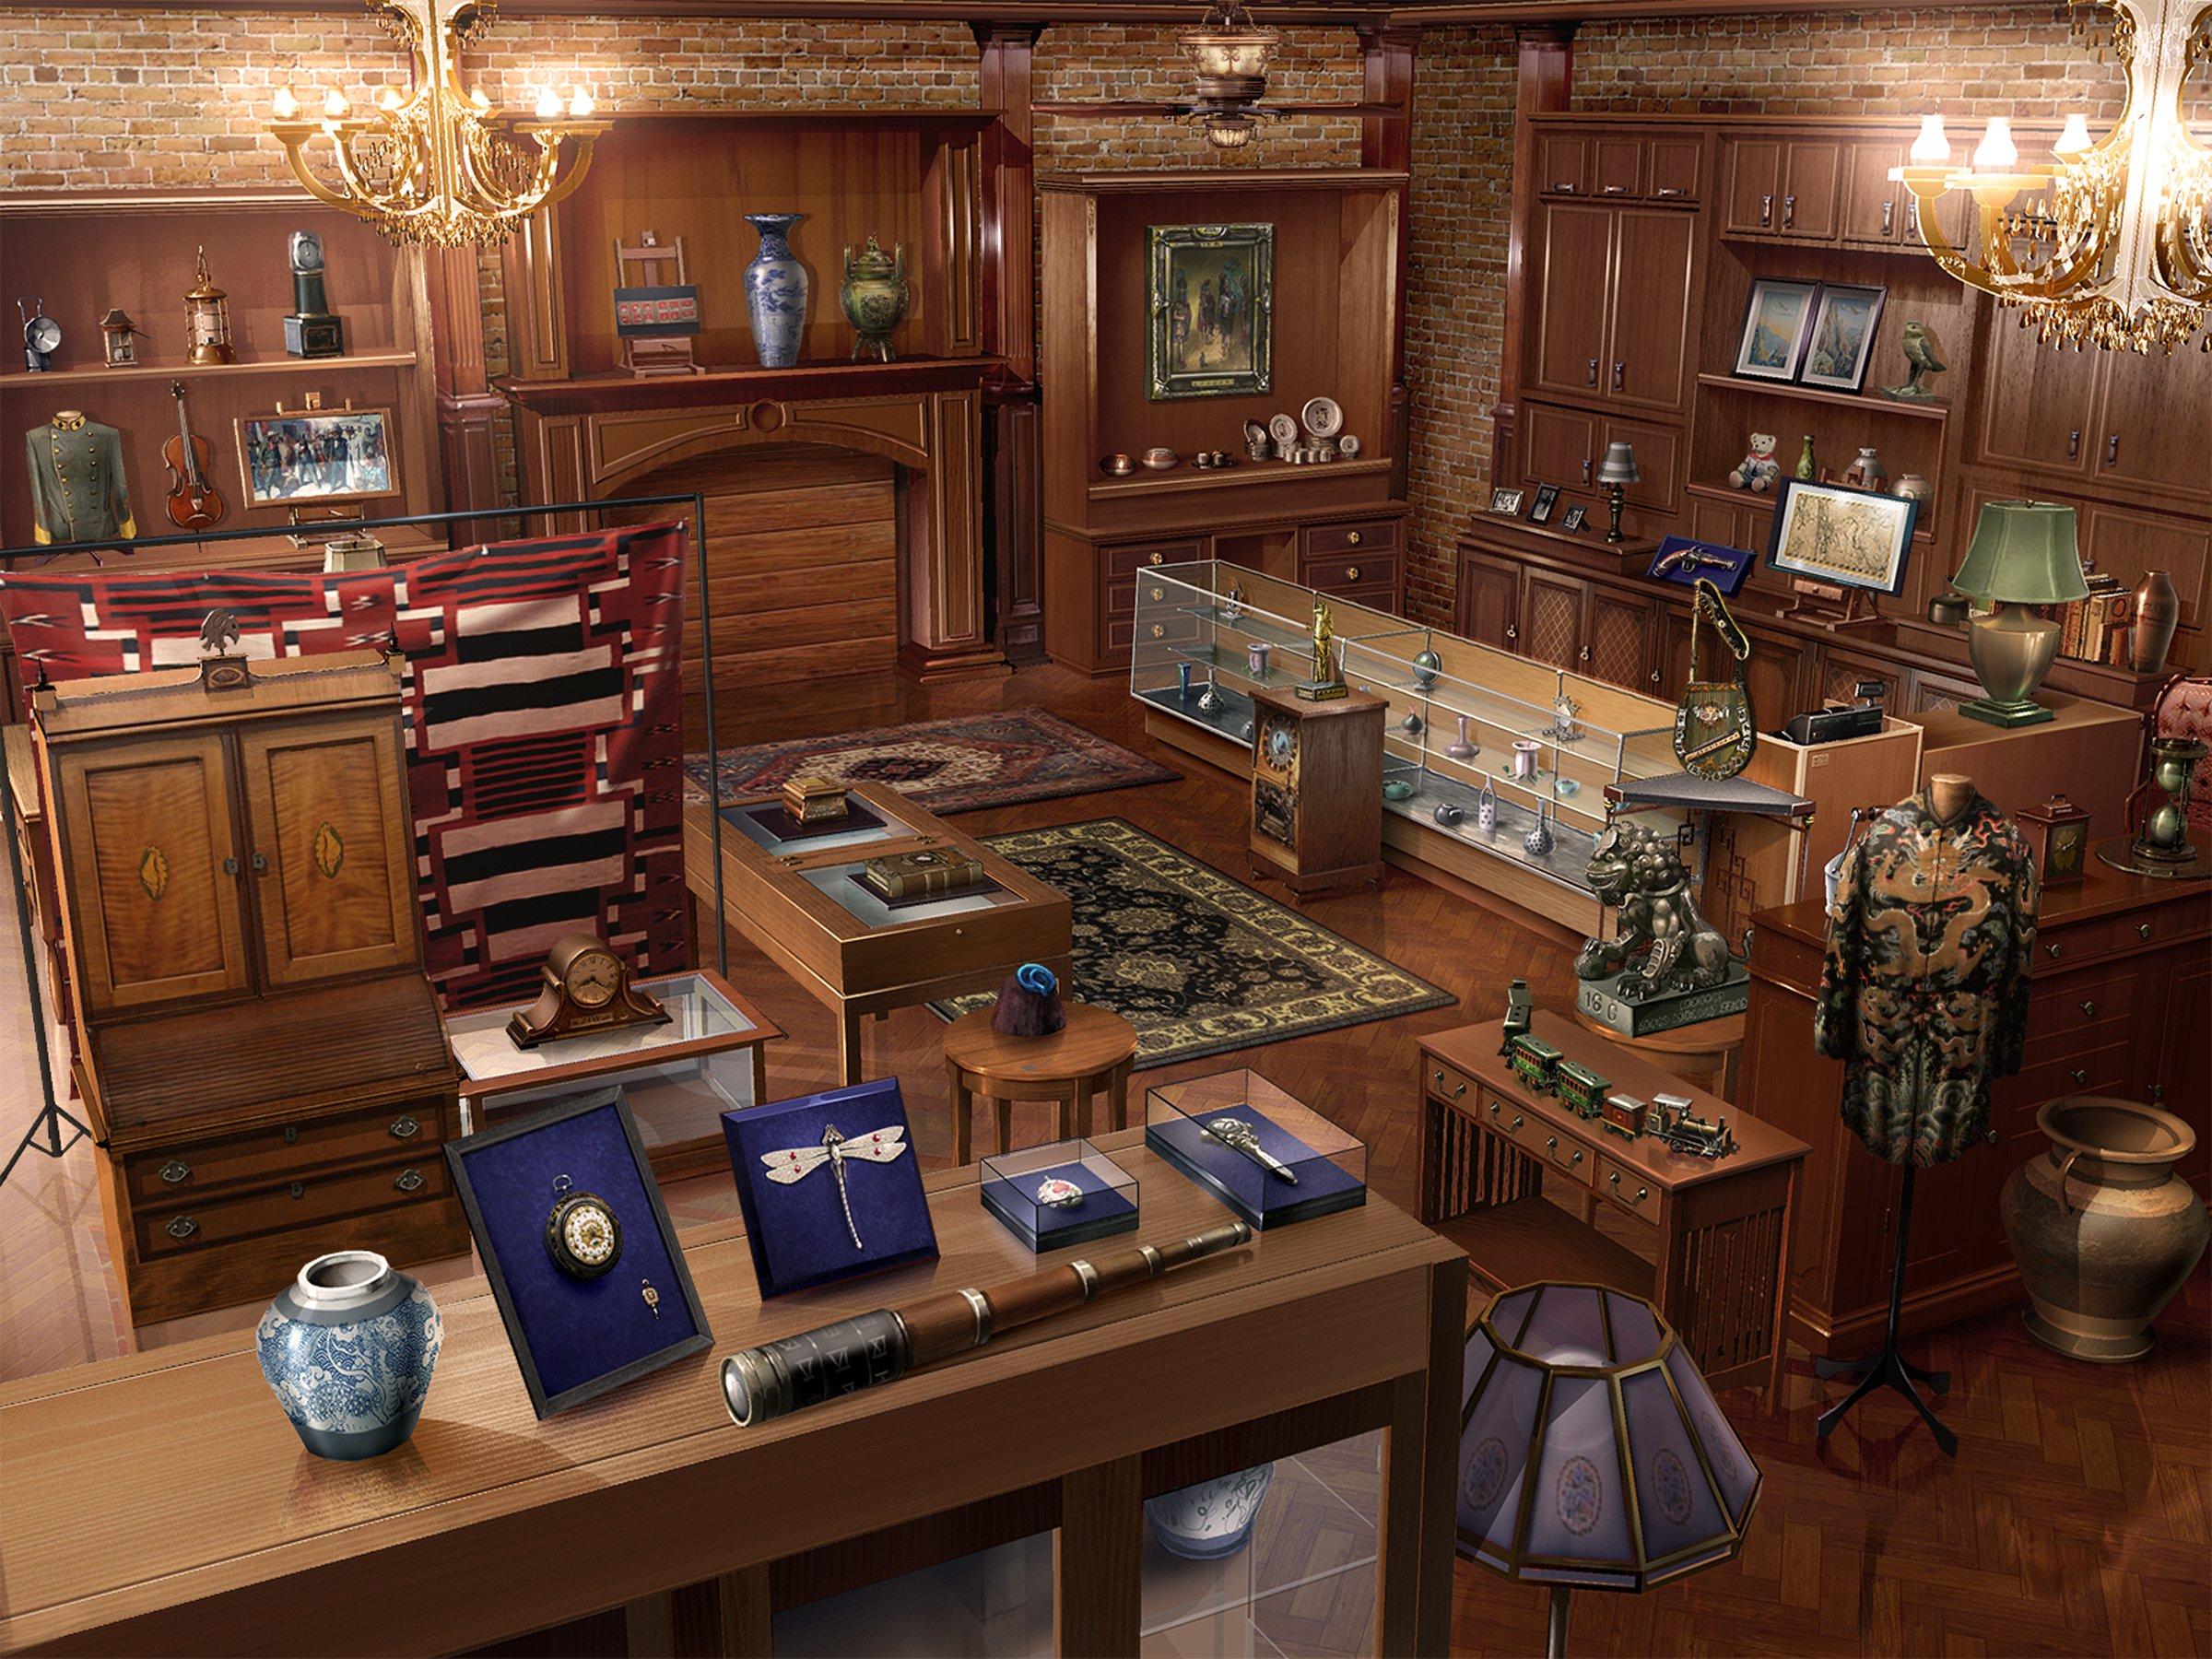 Antique Shop Vintage Design Interior Room Wallpaper 2400x1800 421660 Wallpaperup